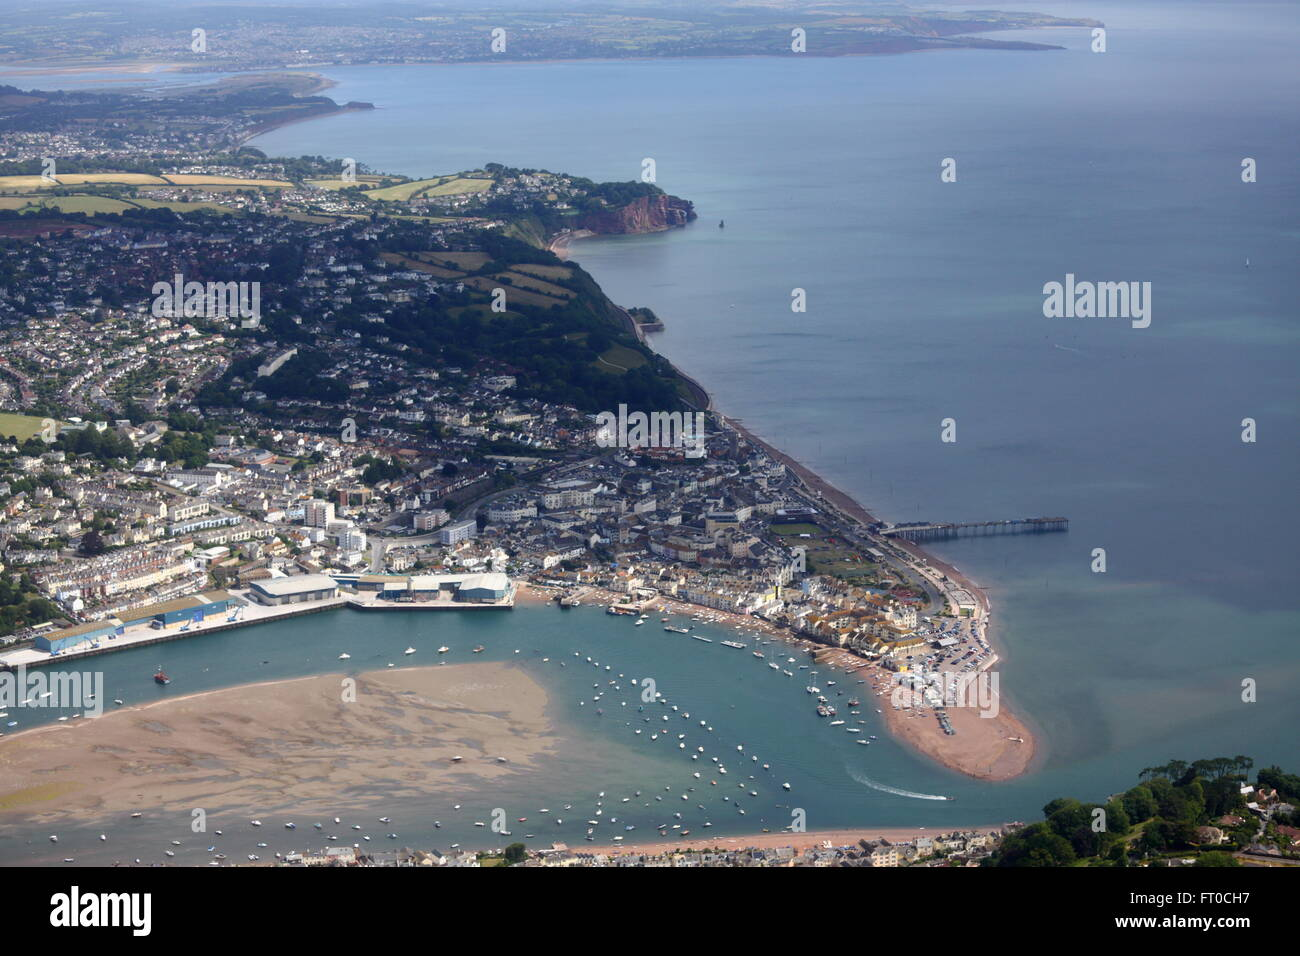 Aerial view of coast near Teignmouth, Dawlish, Exmouth Stock Photo